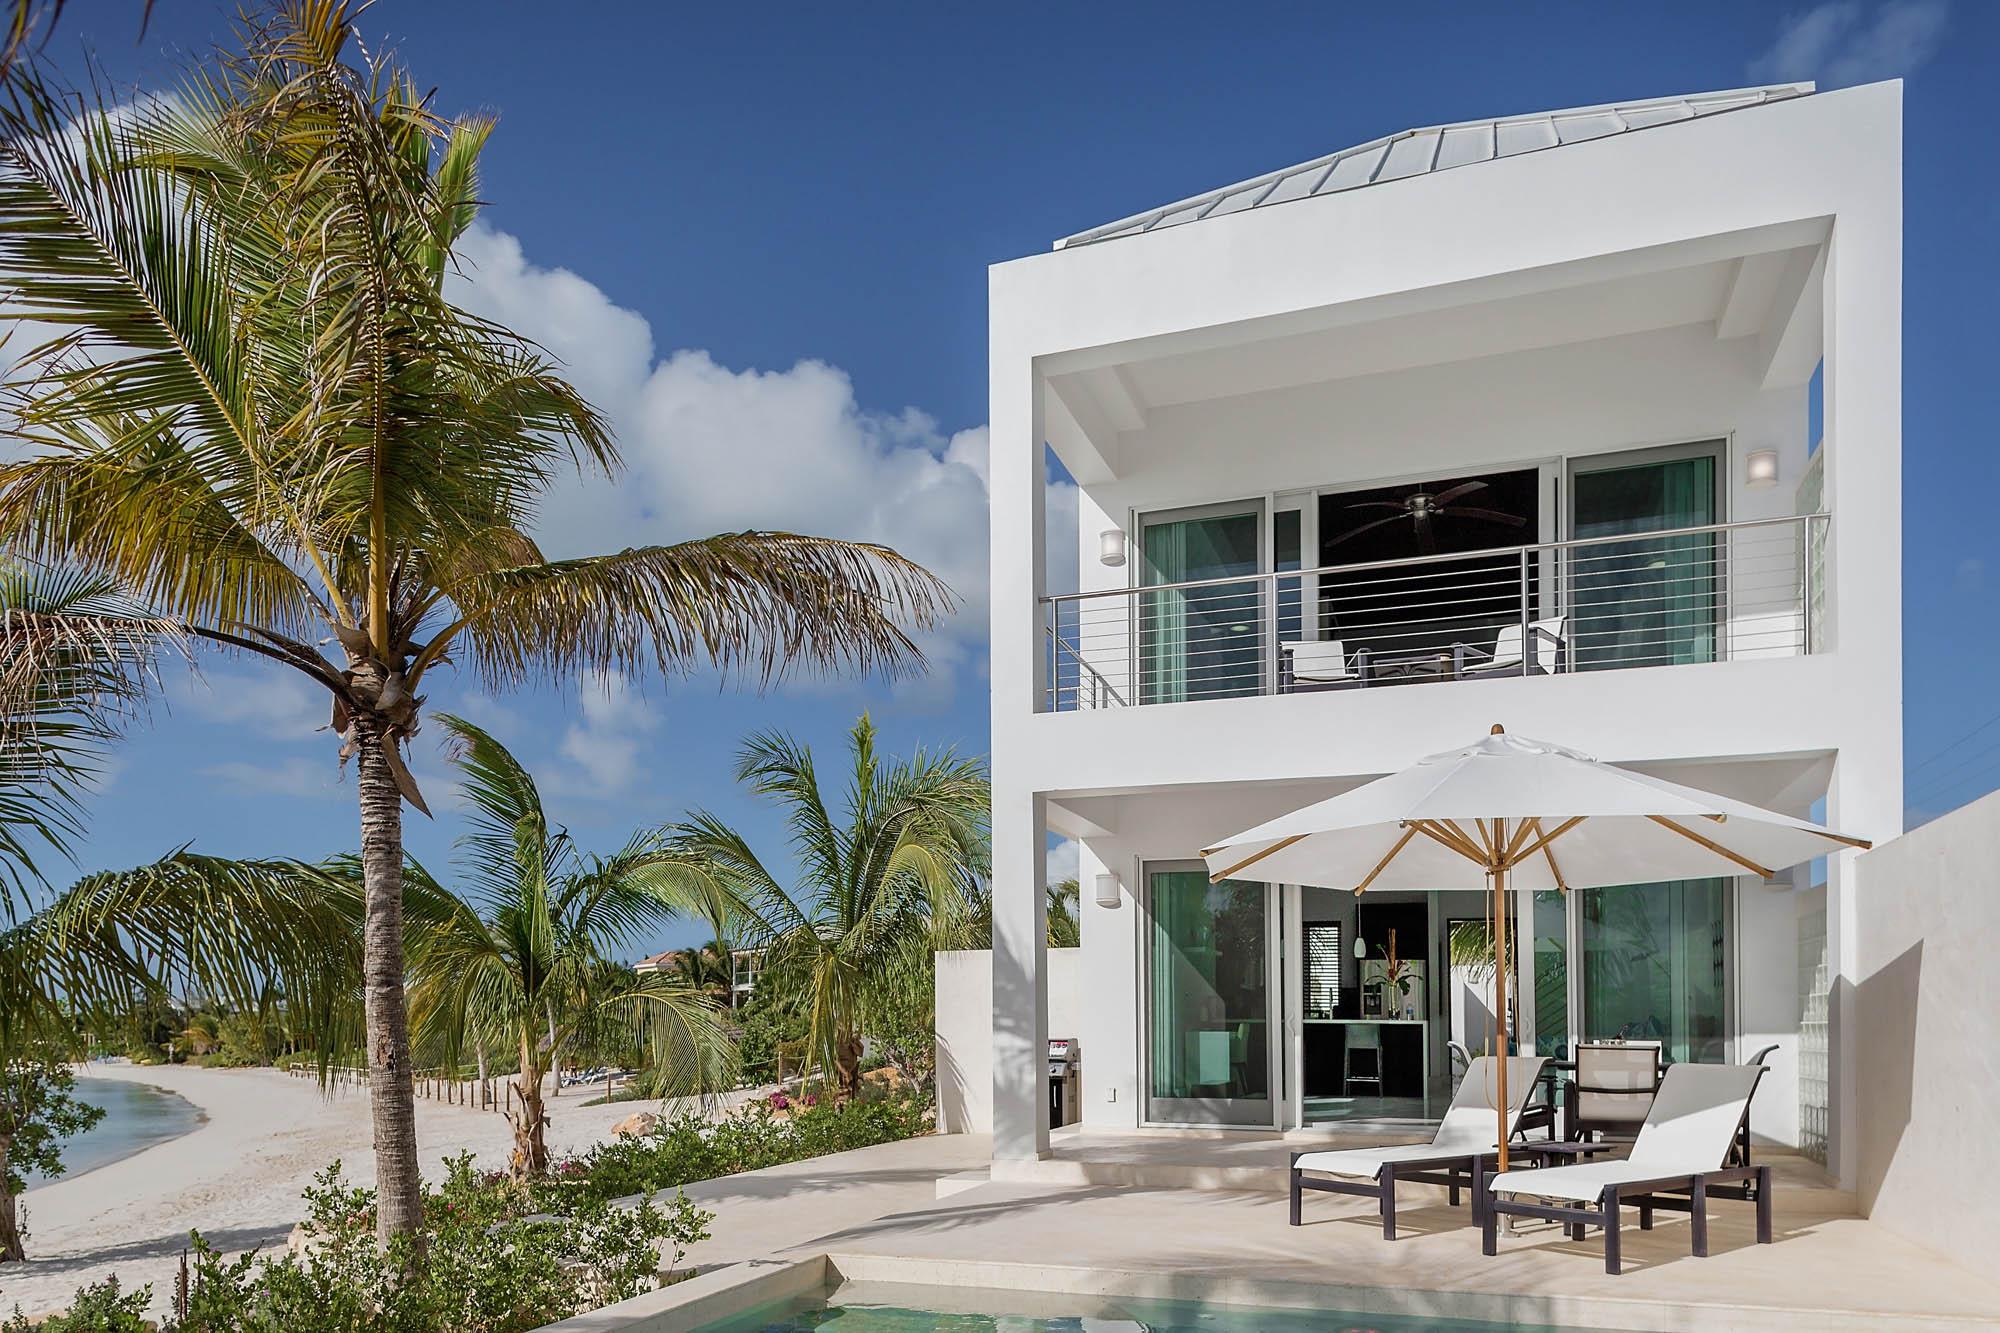 Villa Positano Sapodilla Bay Beach Providenciales Provo Turks And Caicos Islands